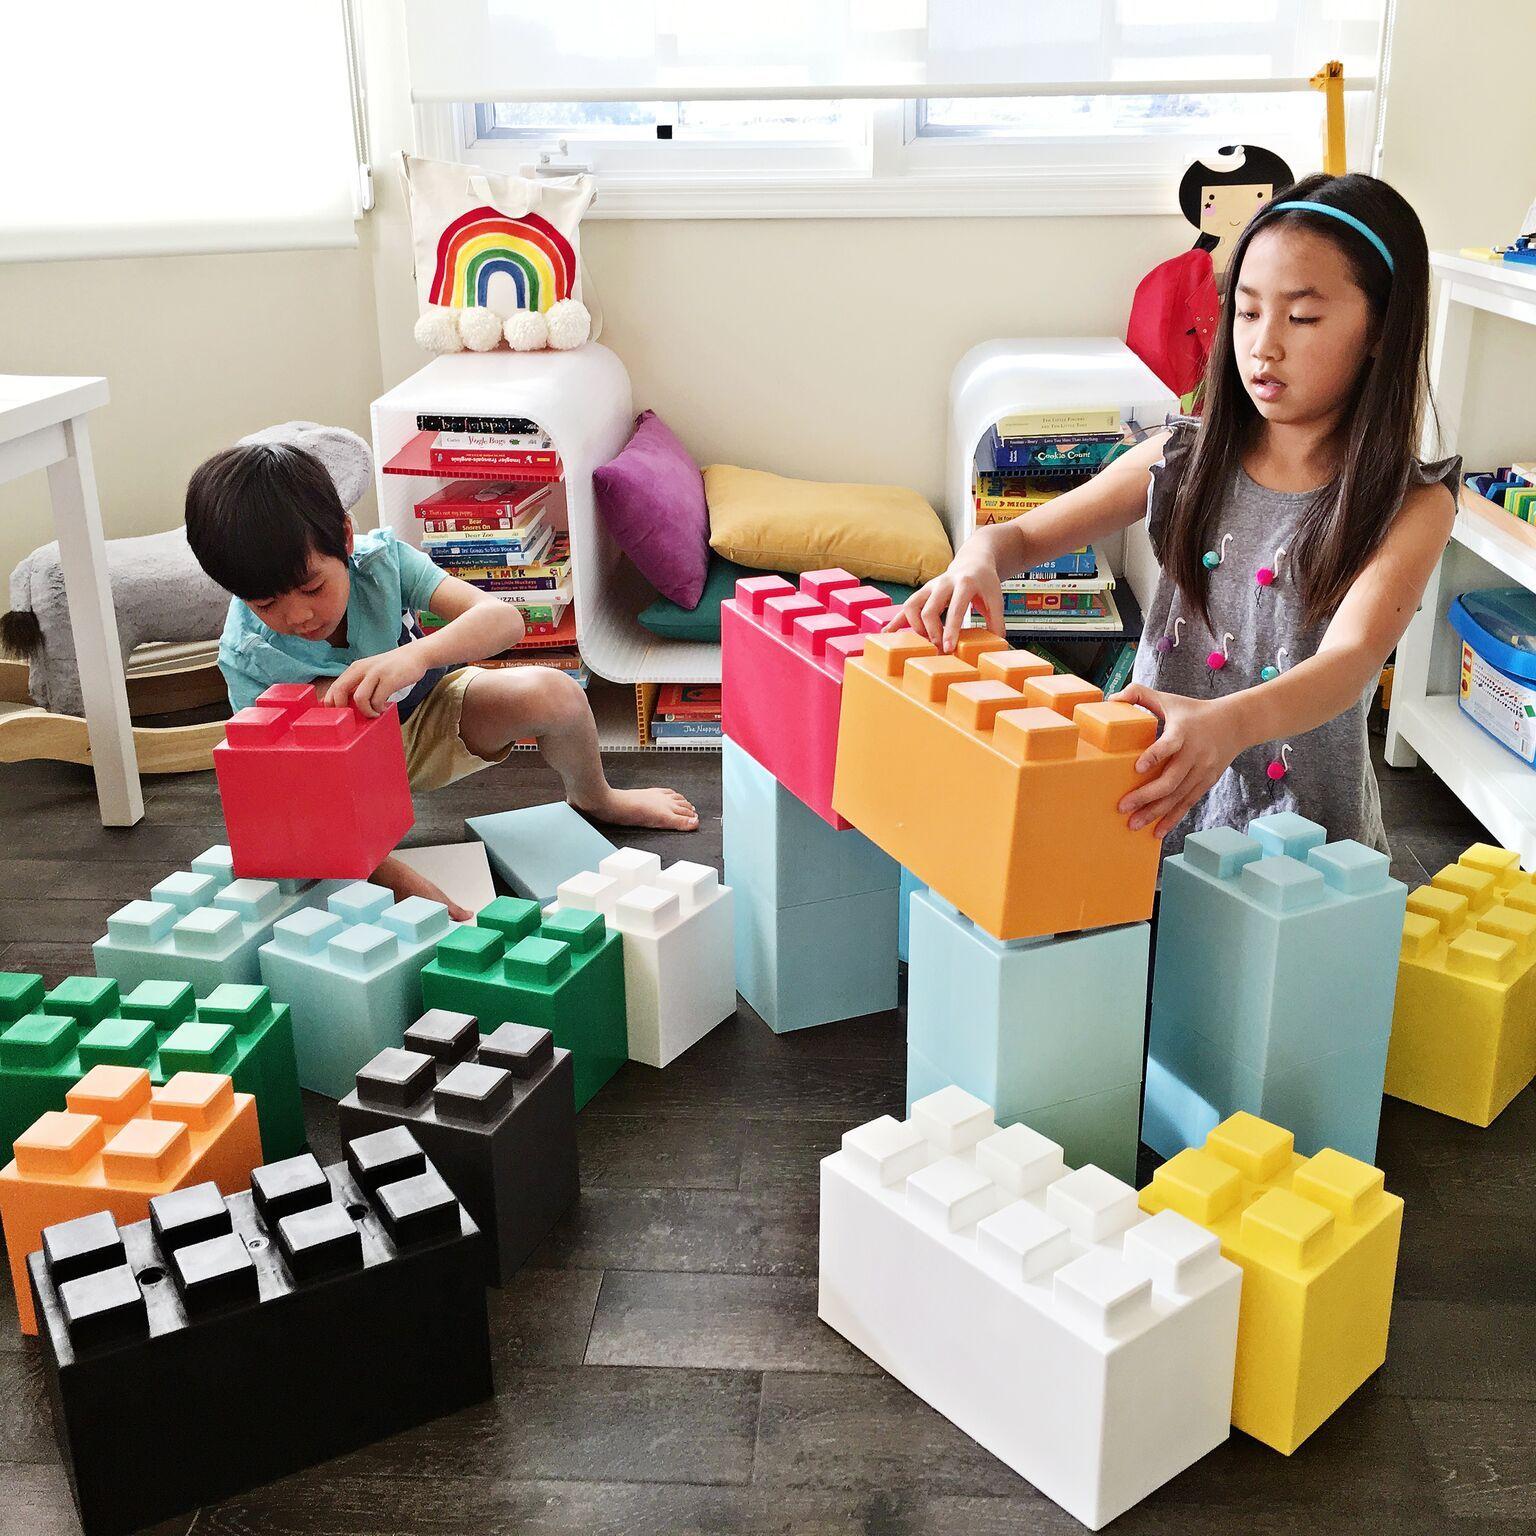 Giant Lego Like Building Blocks